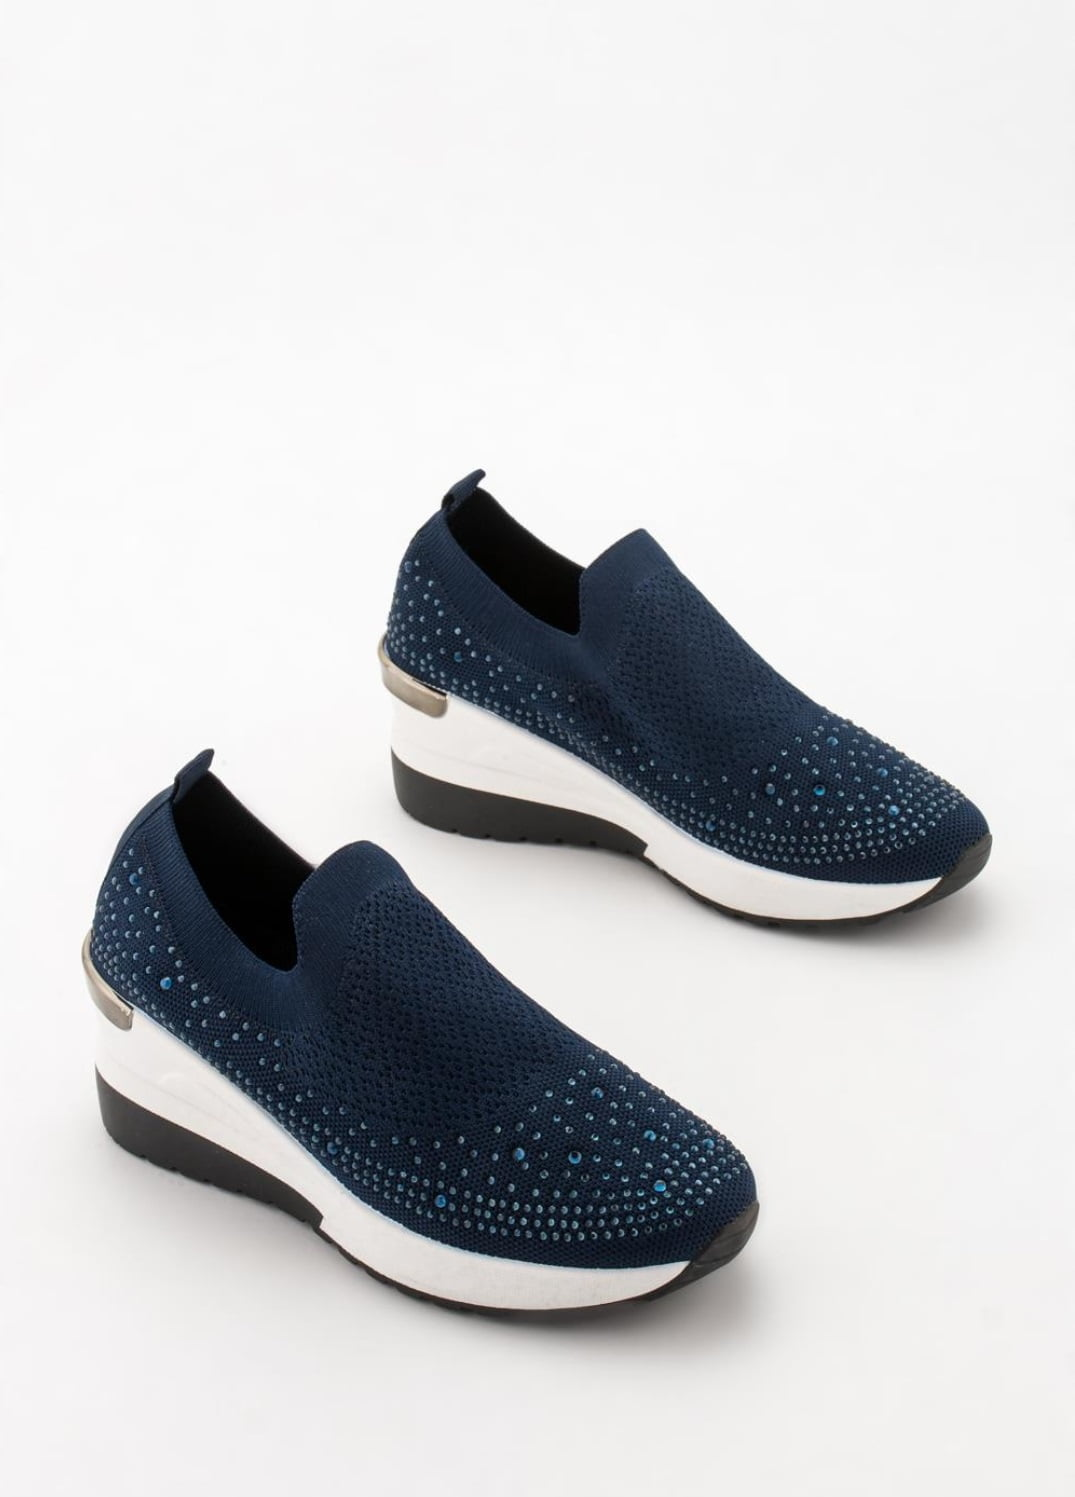 Sneakers Women's Sock with BLUE